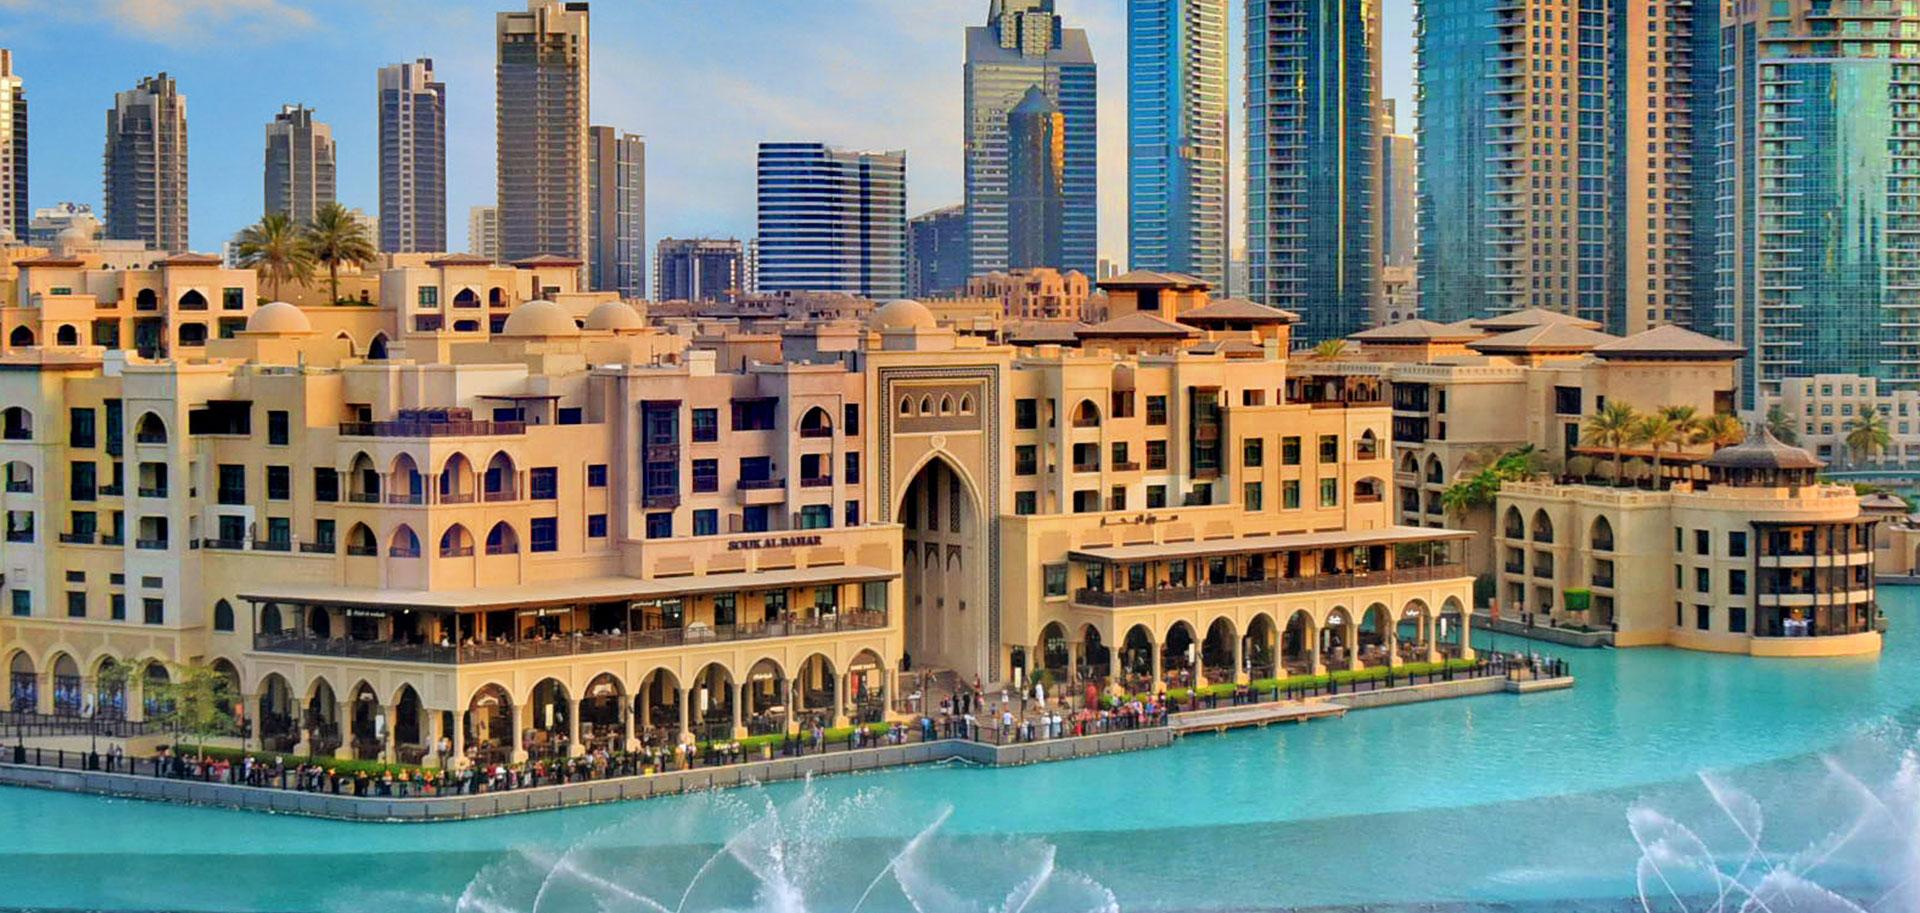 Home Time Out Market Dubai